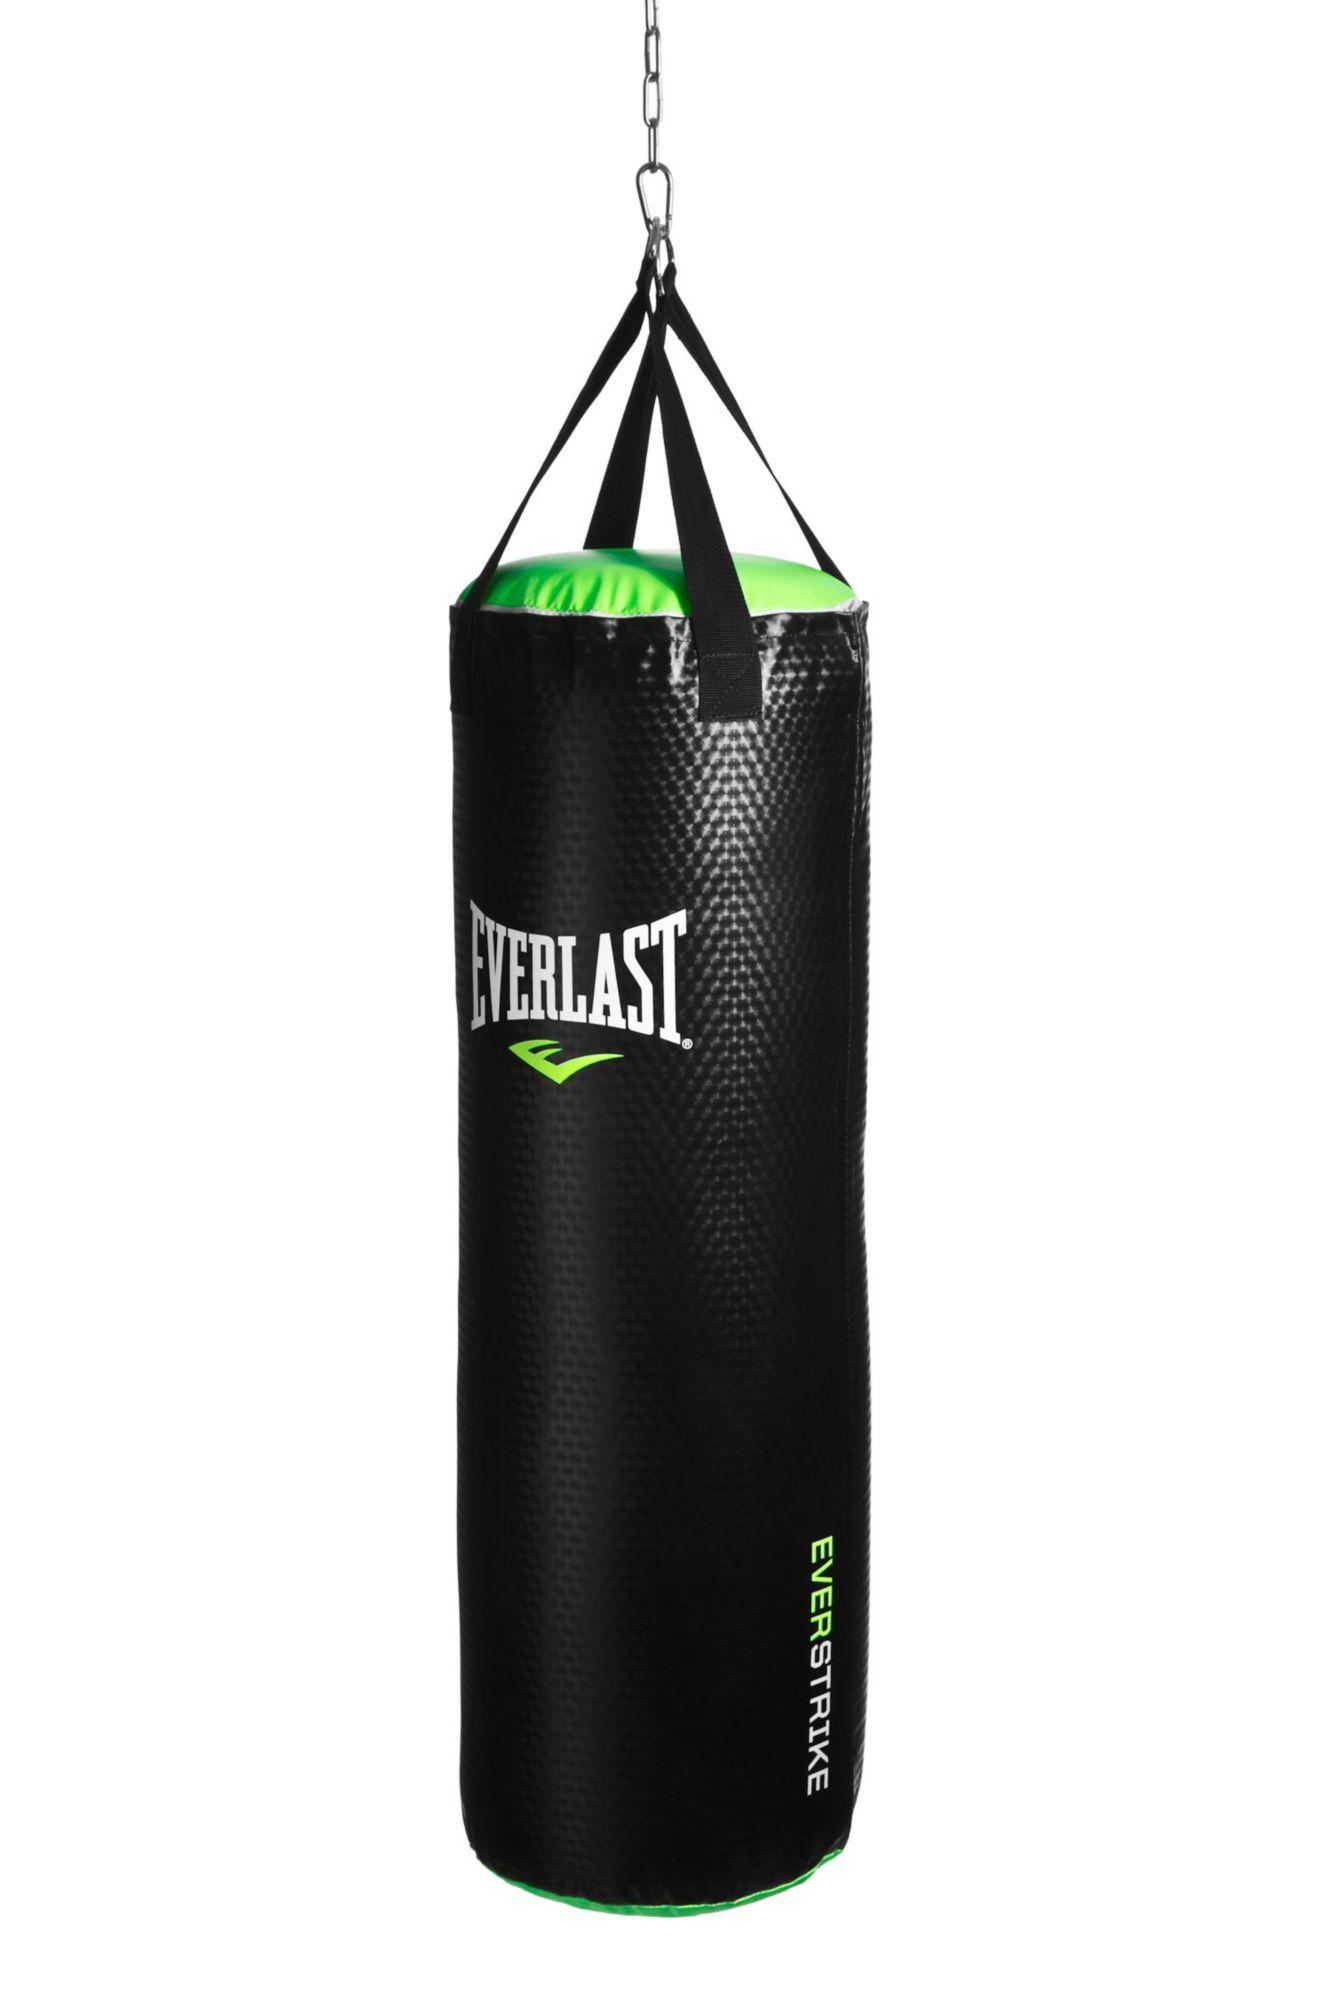 product image everlast 70 lb everstrike nevatear heavy training bag